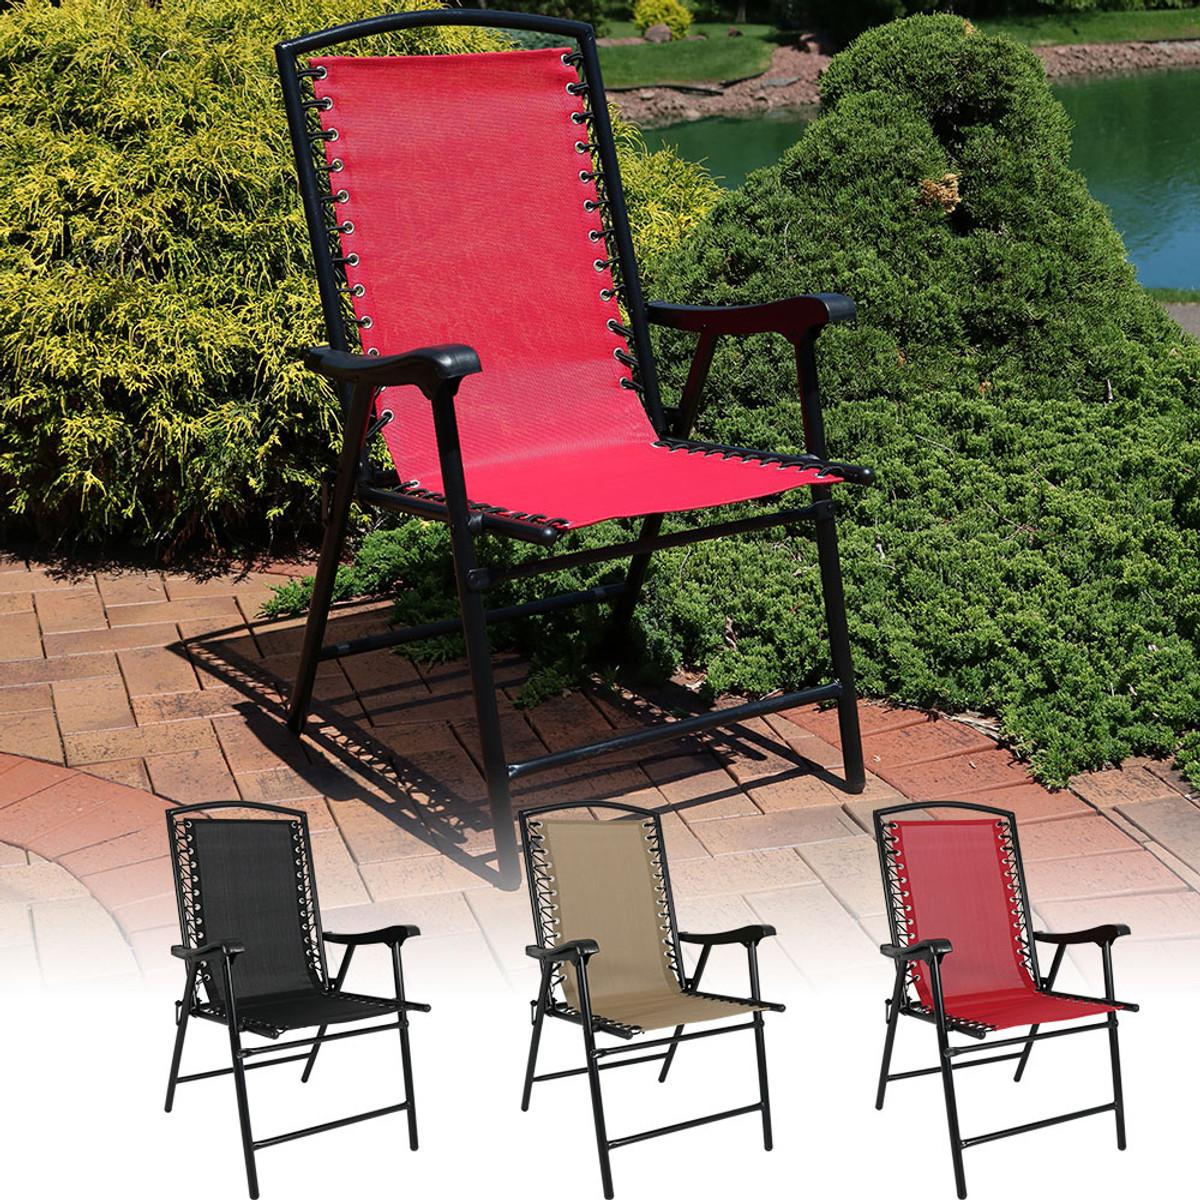 Marvelous Sunnydaze Mesh Outdoor Suspension Folding Patio Lounge Chair Pabps2019 Chair Design Images Pabps2019Com